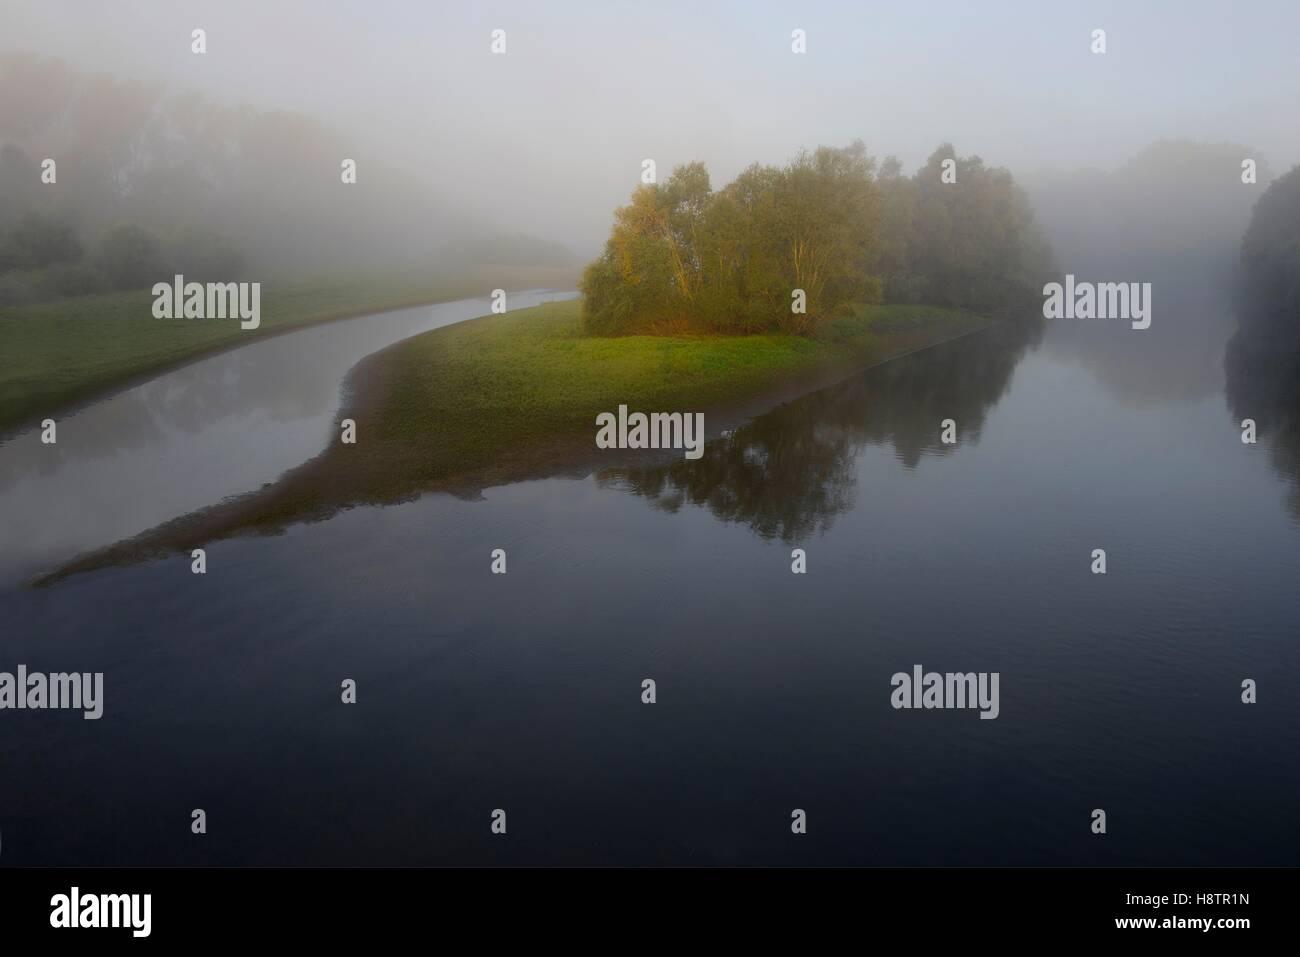 Sauer Delta, Munchhausen, Nature Reserve of Delta Sauer, Alsace, France Stock Photo